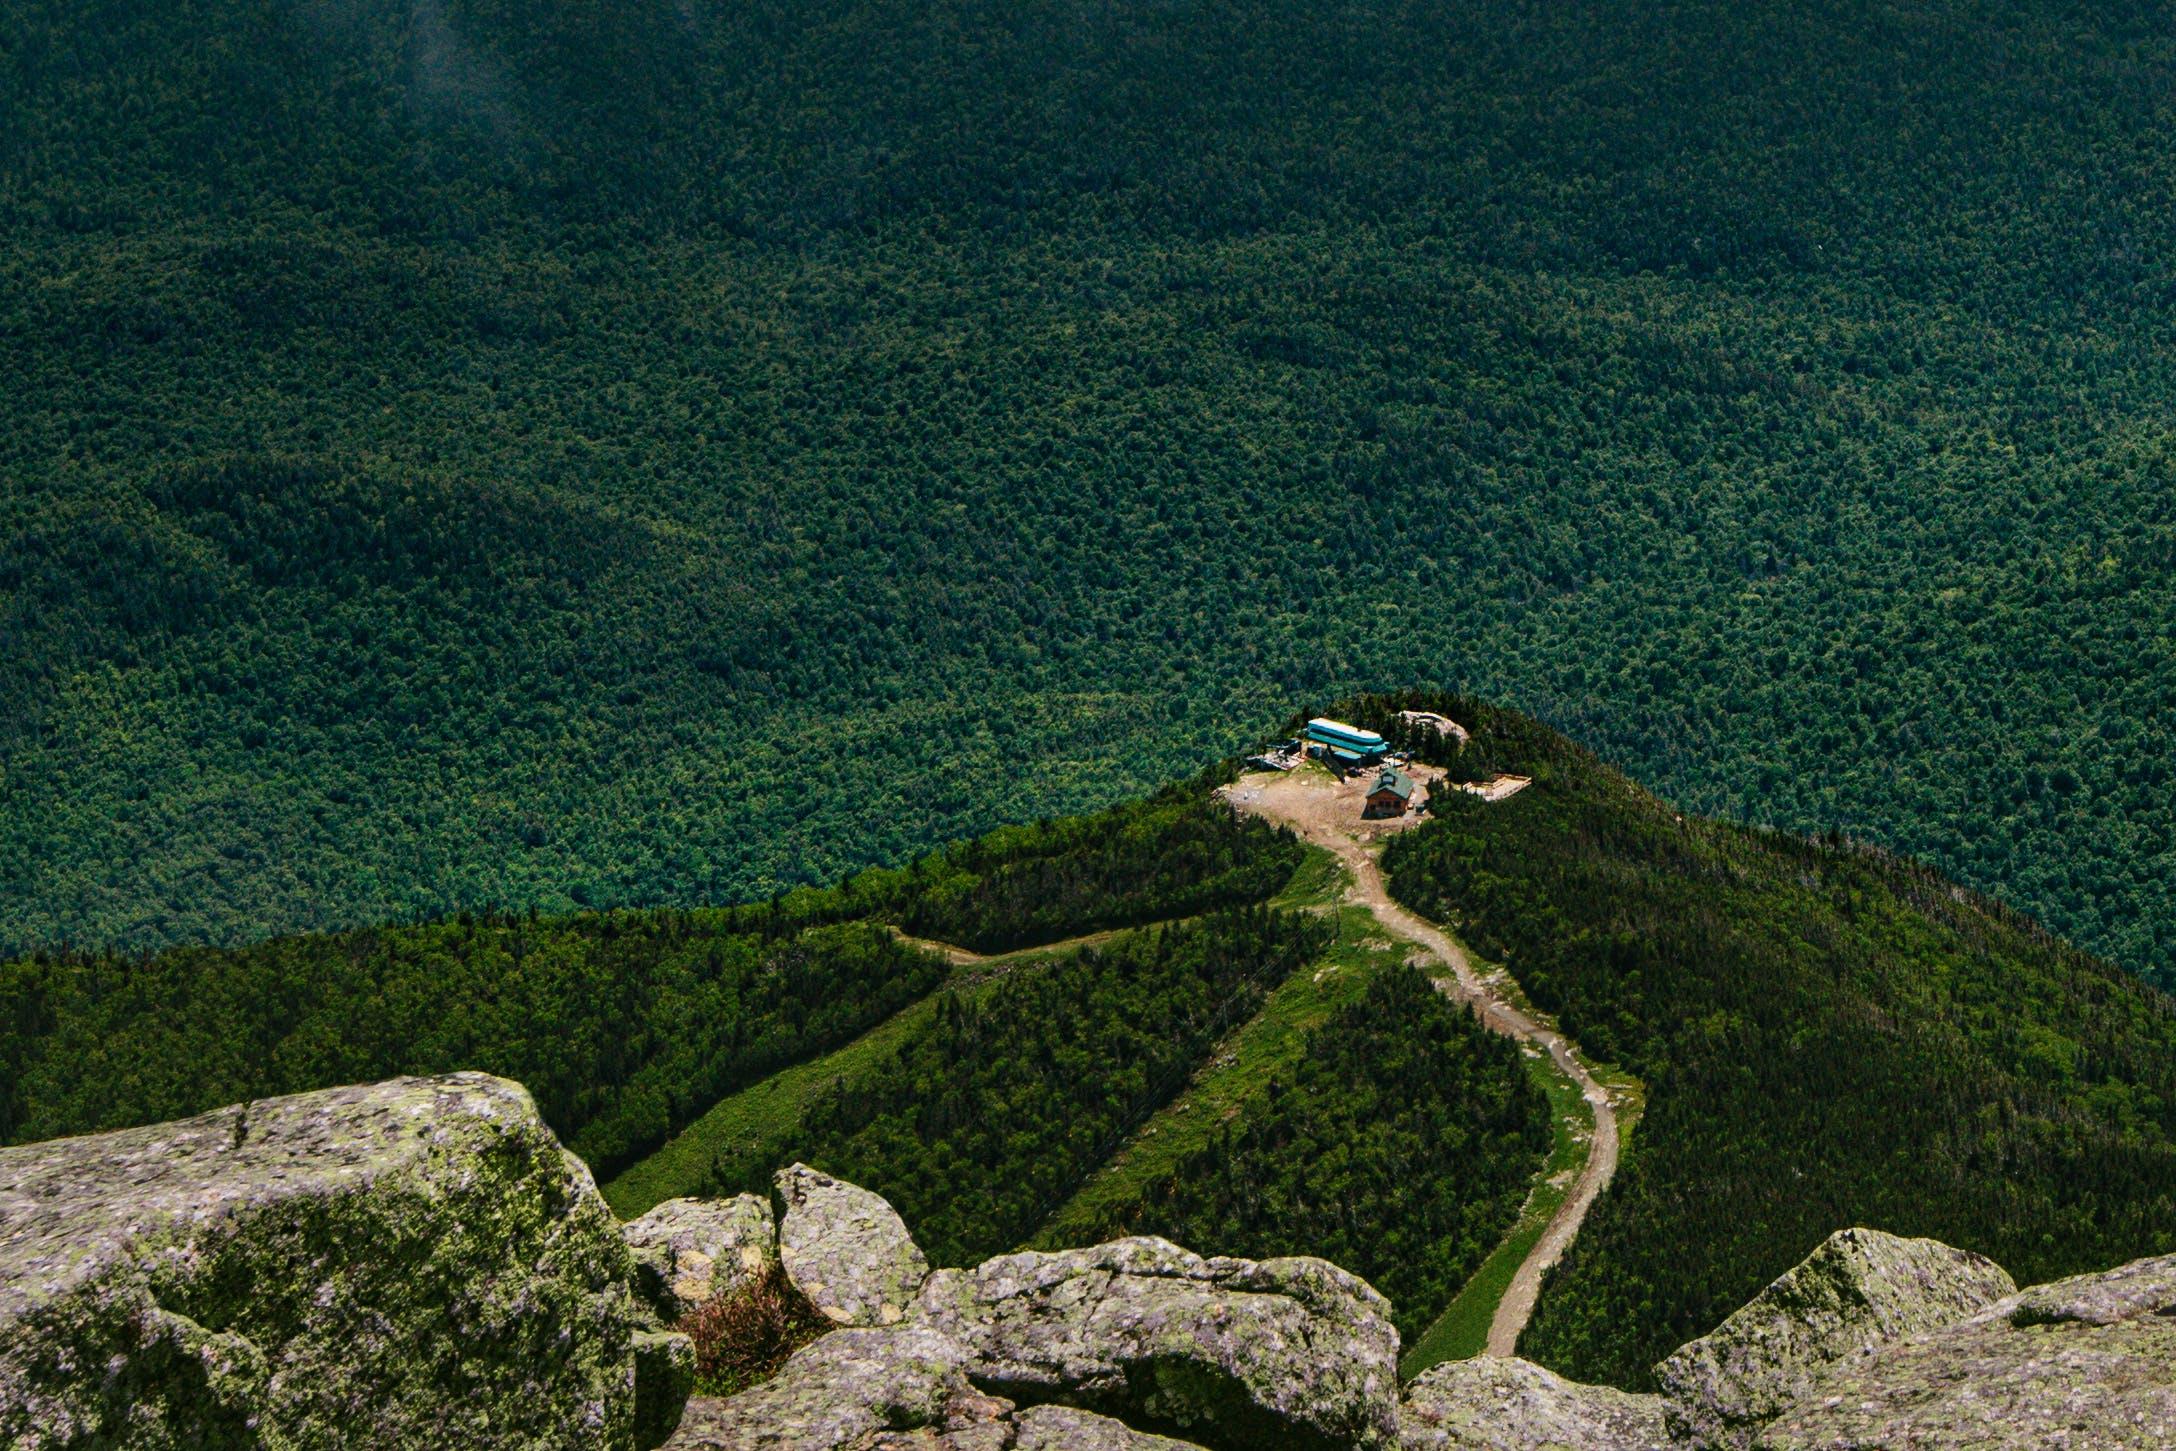 Green Tree on Mountain